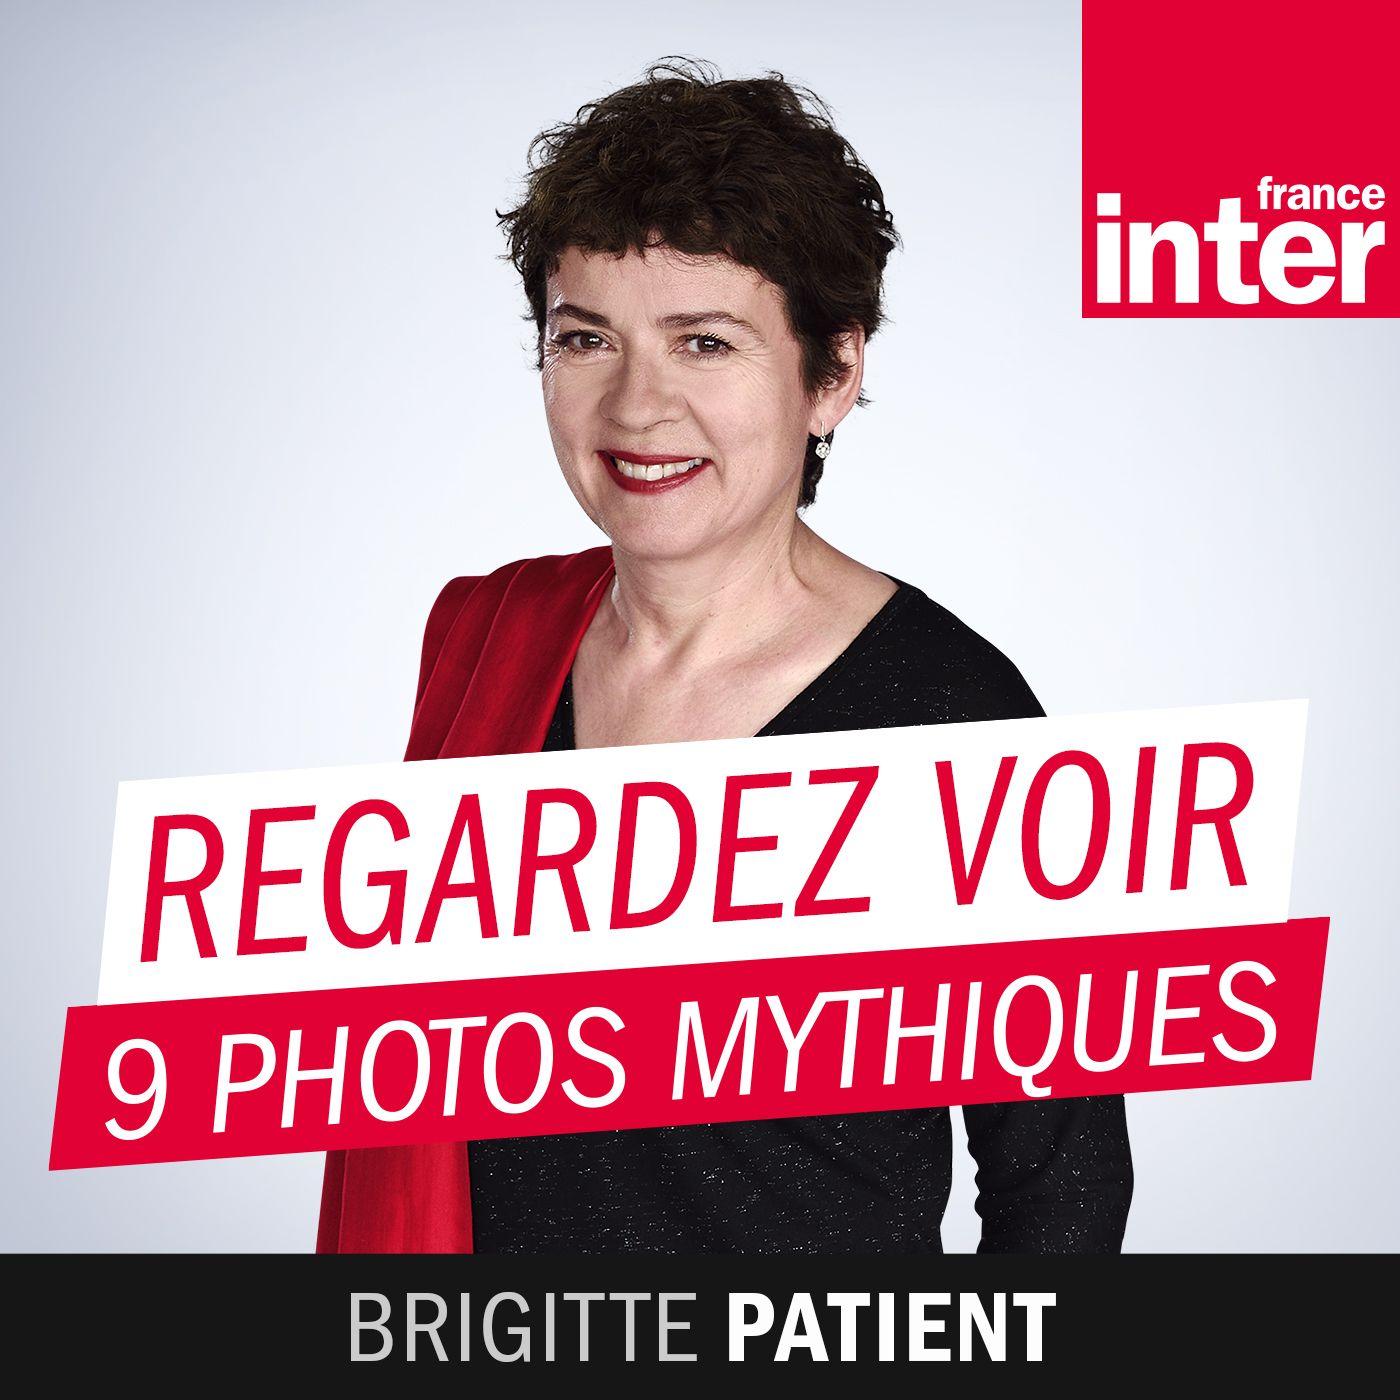 Regardez voir - Brigitte Patient - France Inter